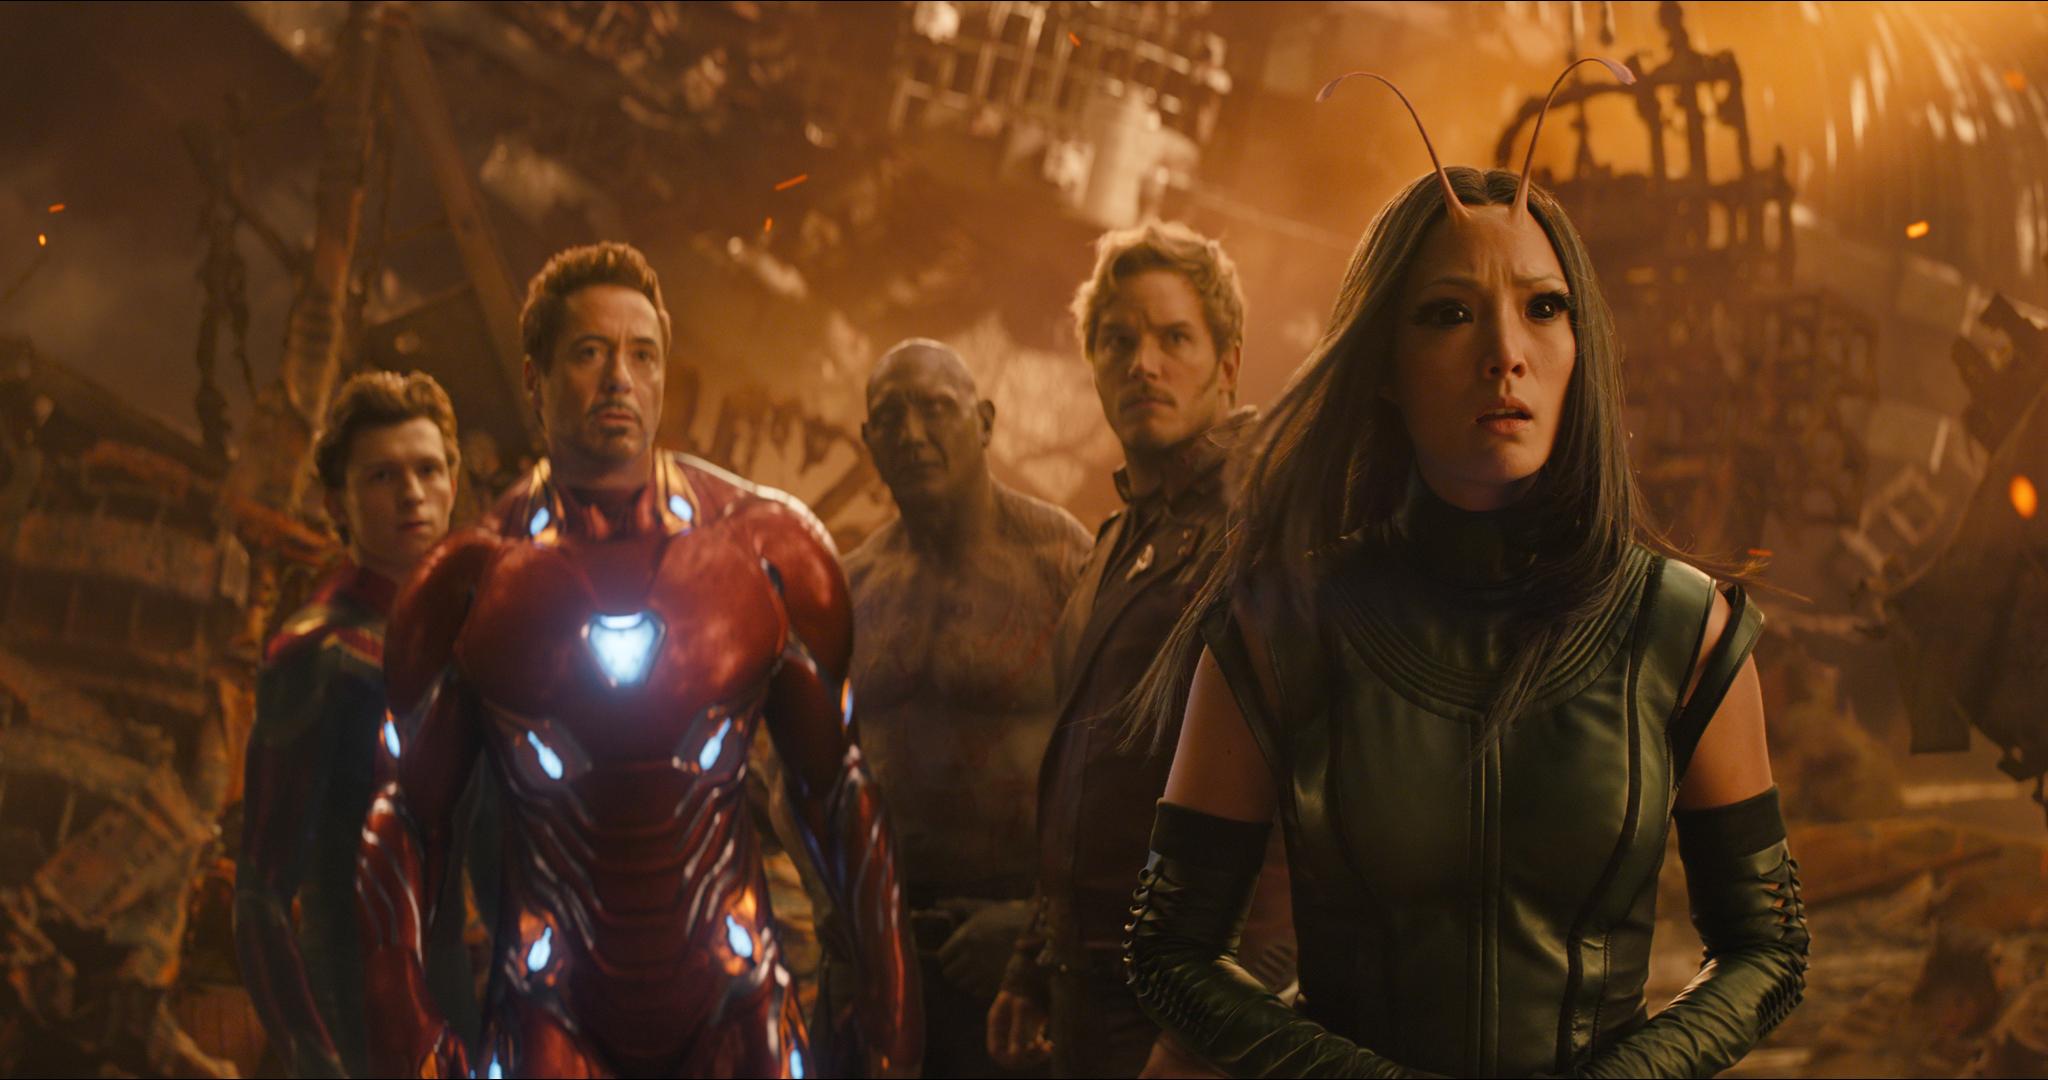 avengers-infinity-war-hi-res-images-3.jpg